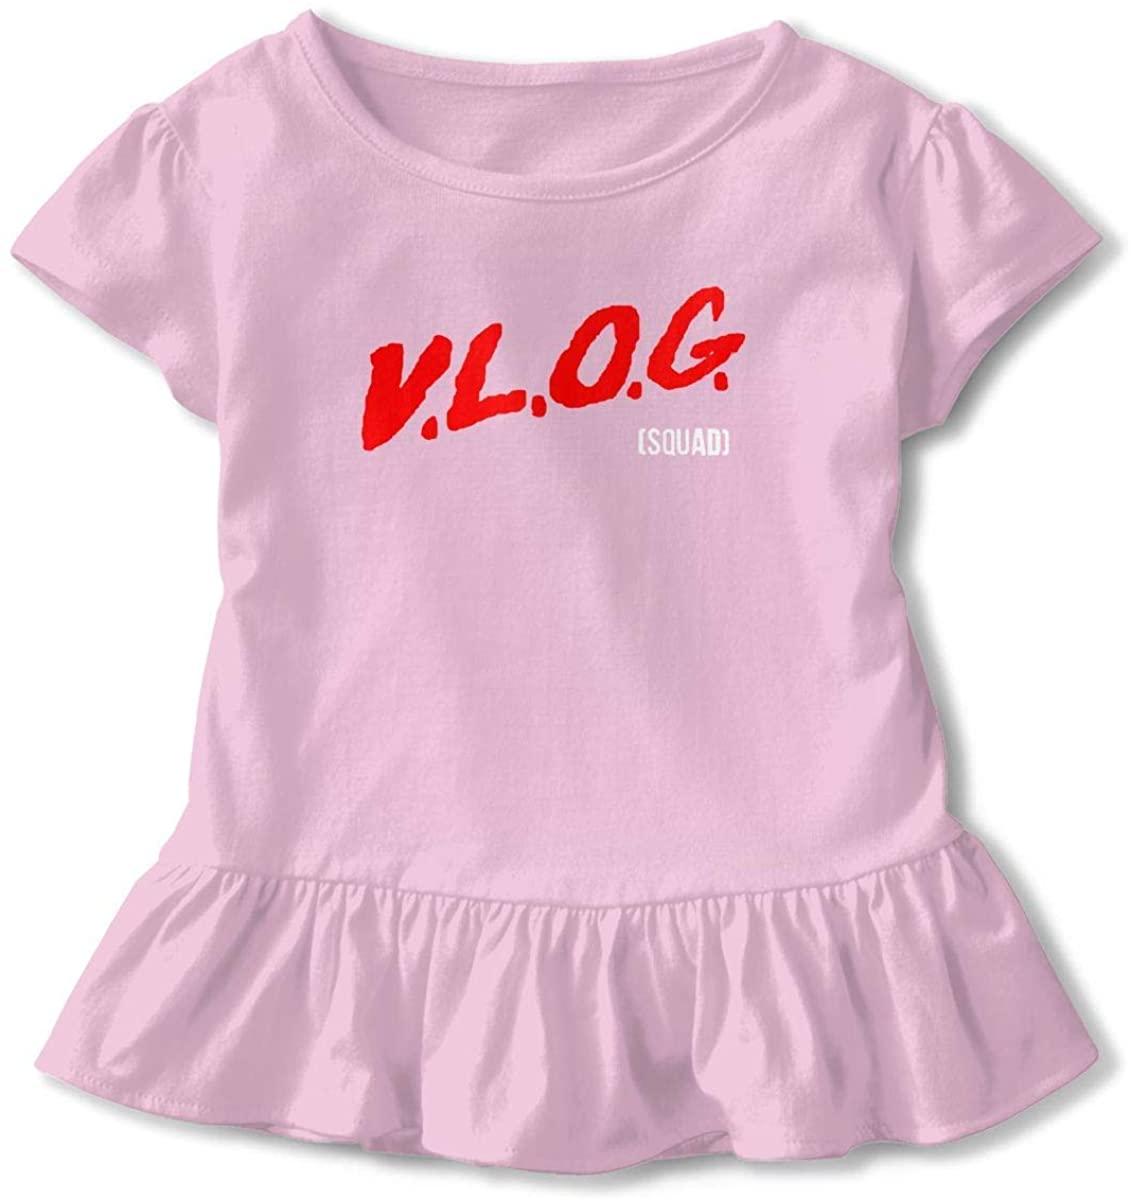 Kid T Shirt Dobrik&Davids Vlog 3D Tee Baseball Ruffle Short Sleeve Cotton Shirts Top for Girls Kids Pink5/6T